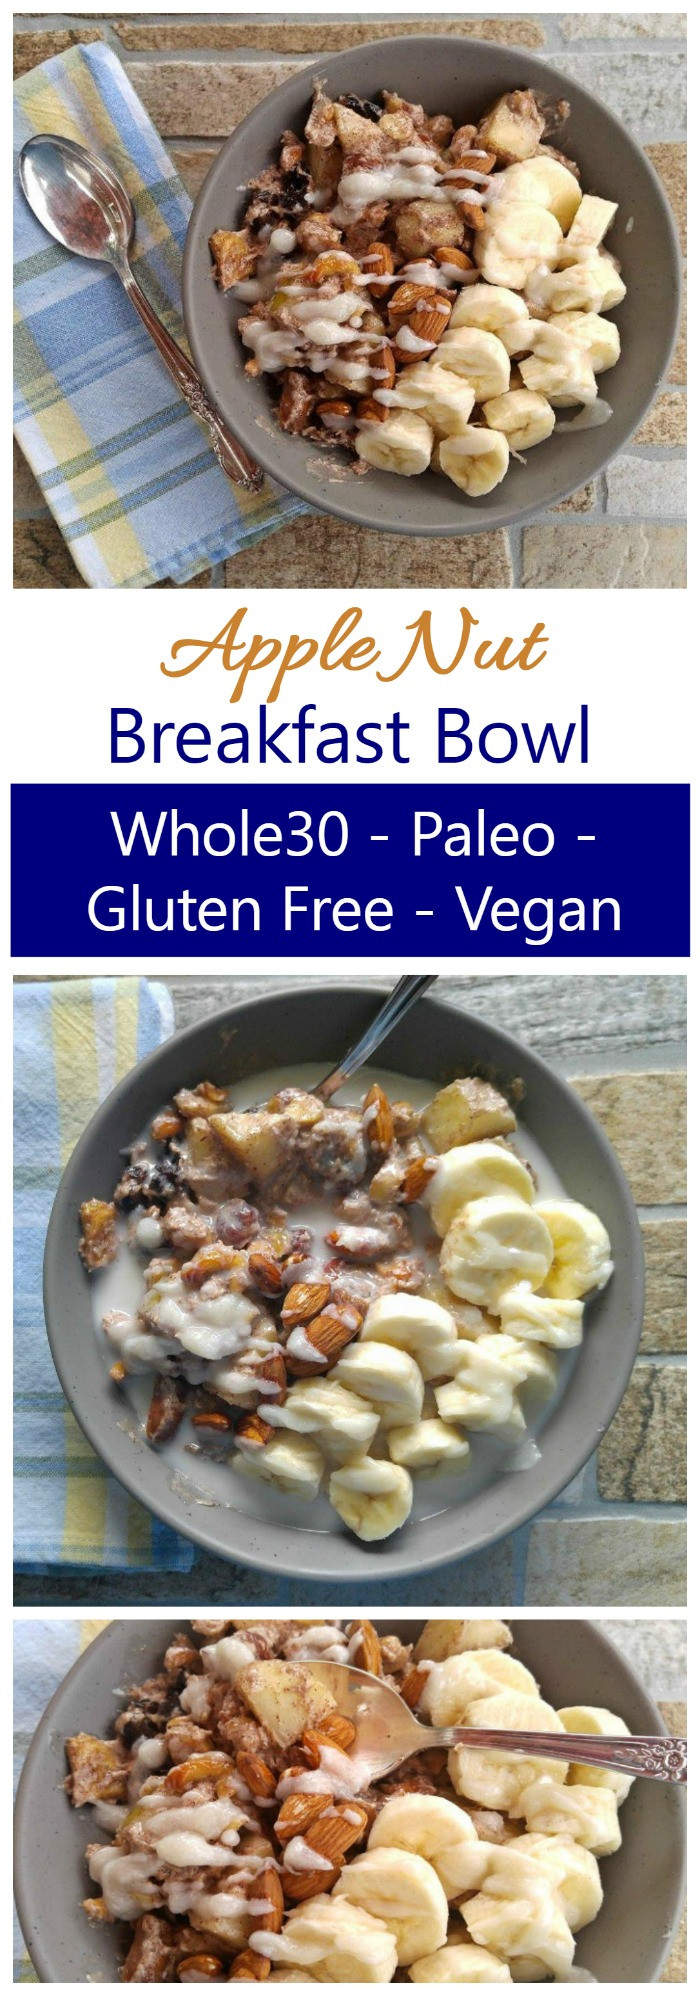 Whole 30 Recipes Breakfast  Whole30 Breakfast Bowl Paleo Gluten Free Whole30